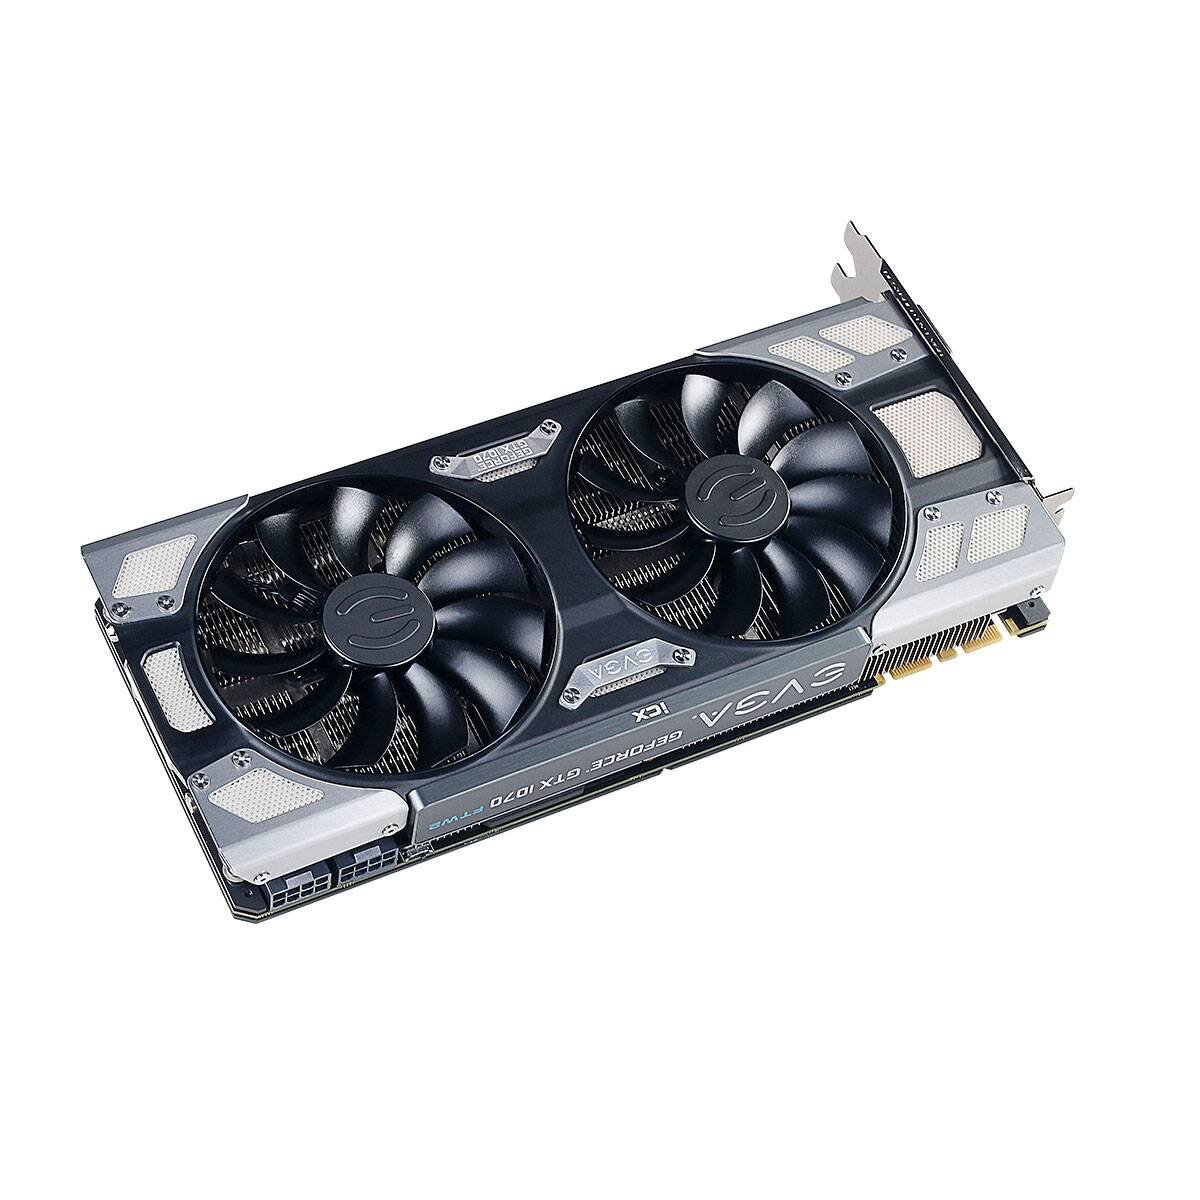 PXOC 8GB GDDR5 LED Scheda Grafica 08G-P4-6173-KR DX12 OSD Supporto EVGA GeForce GTX 1070 SC GAMING ACX 3.0